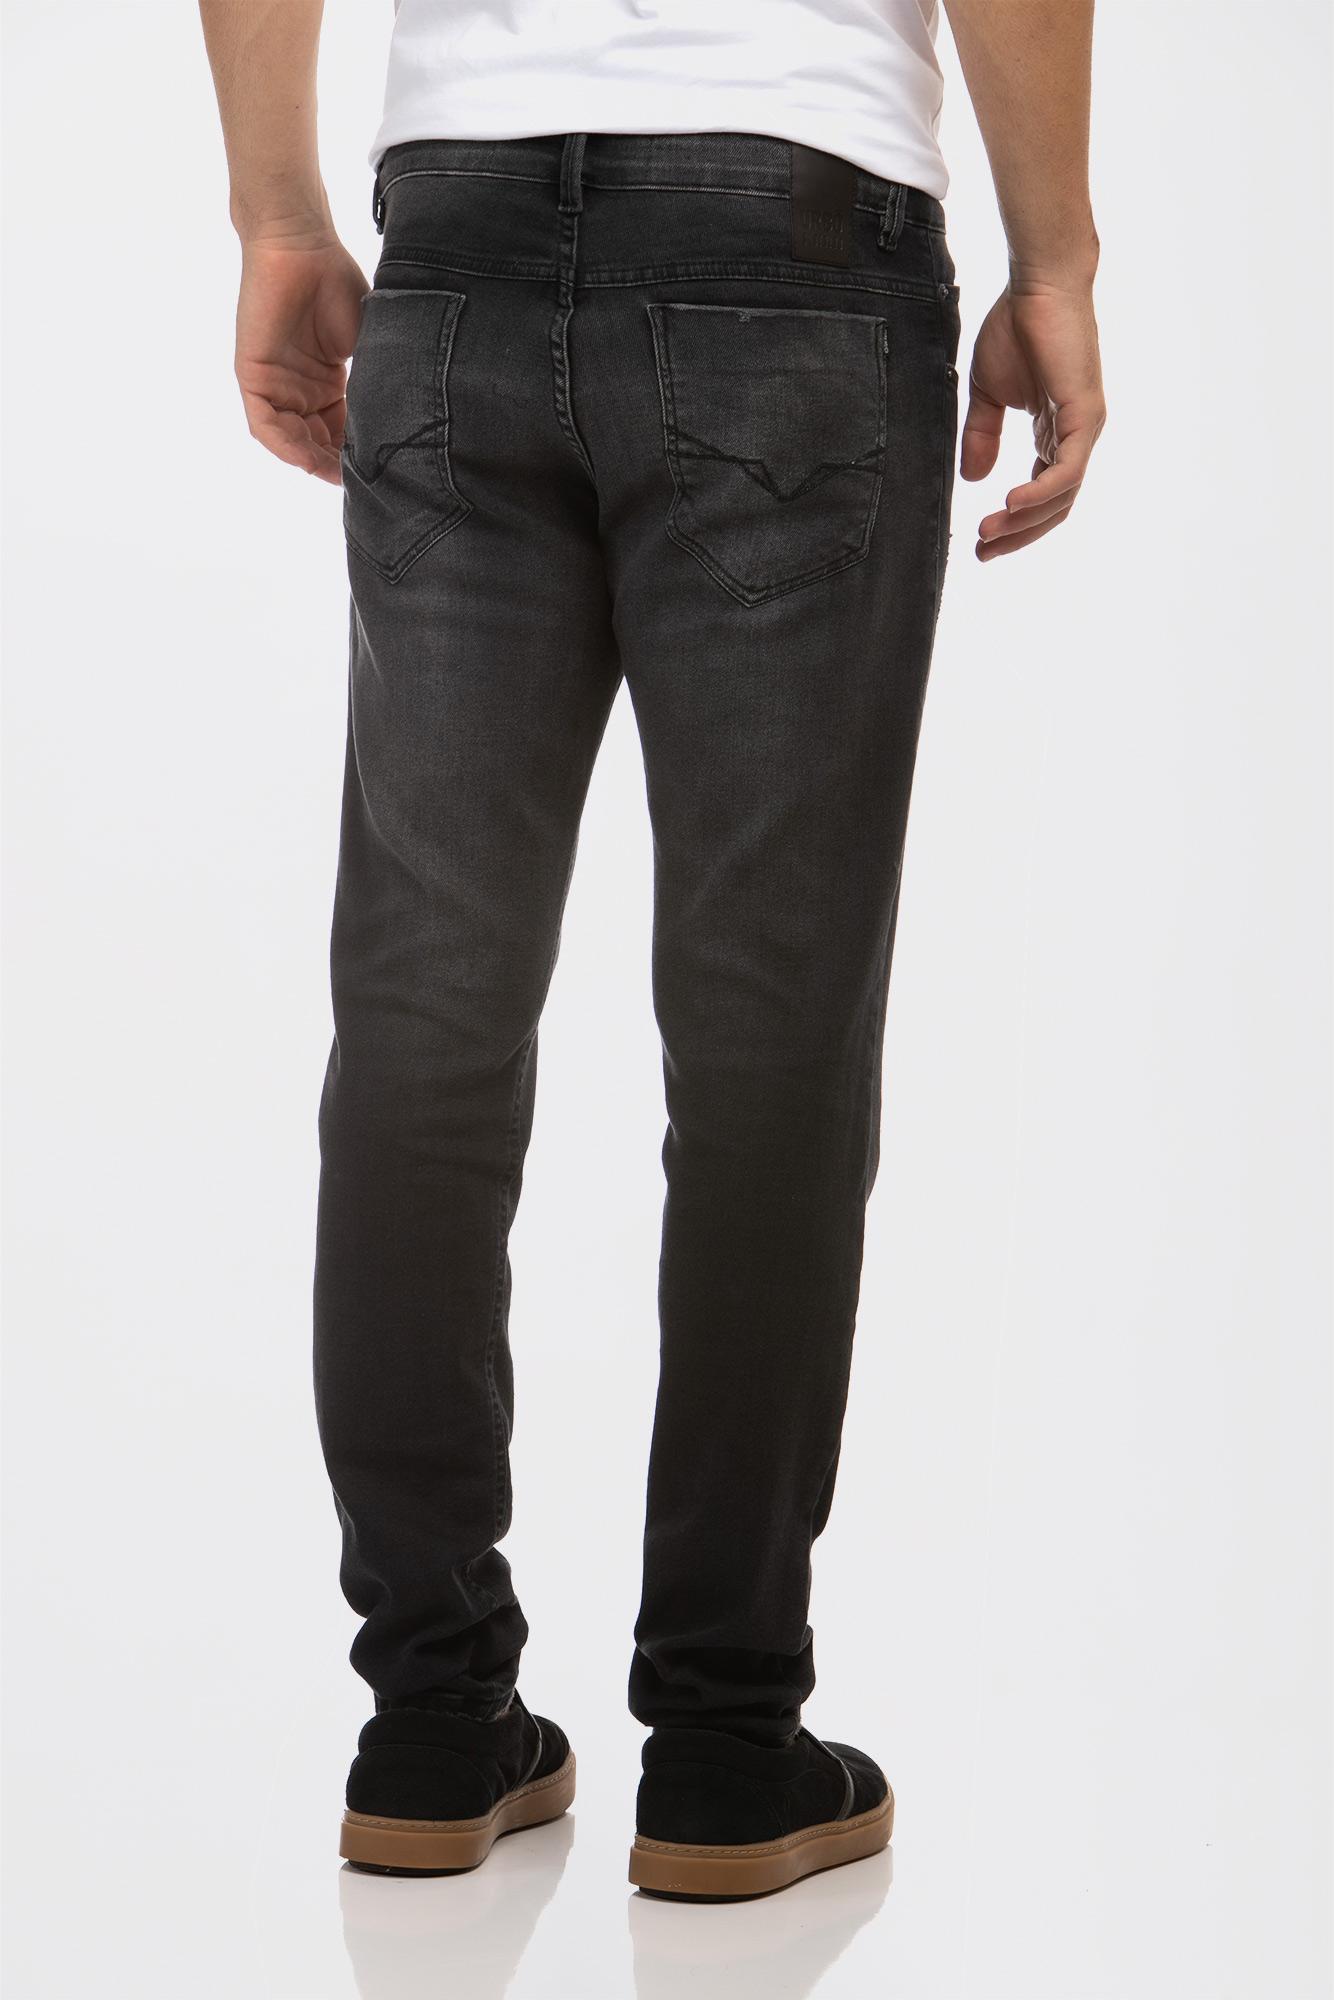 Calça Jeans Slim Fit Black Style